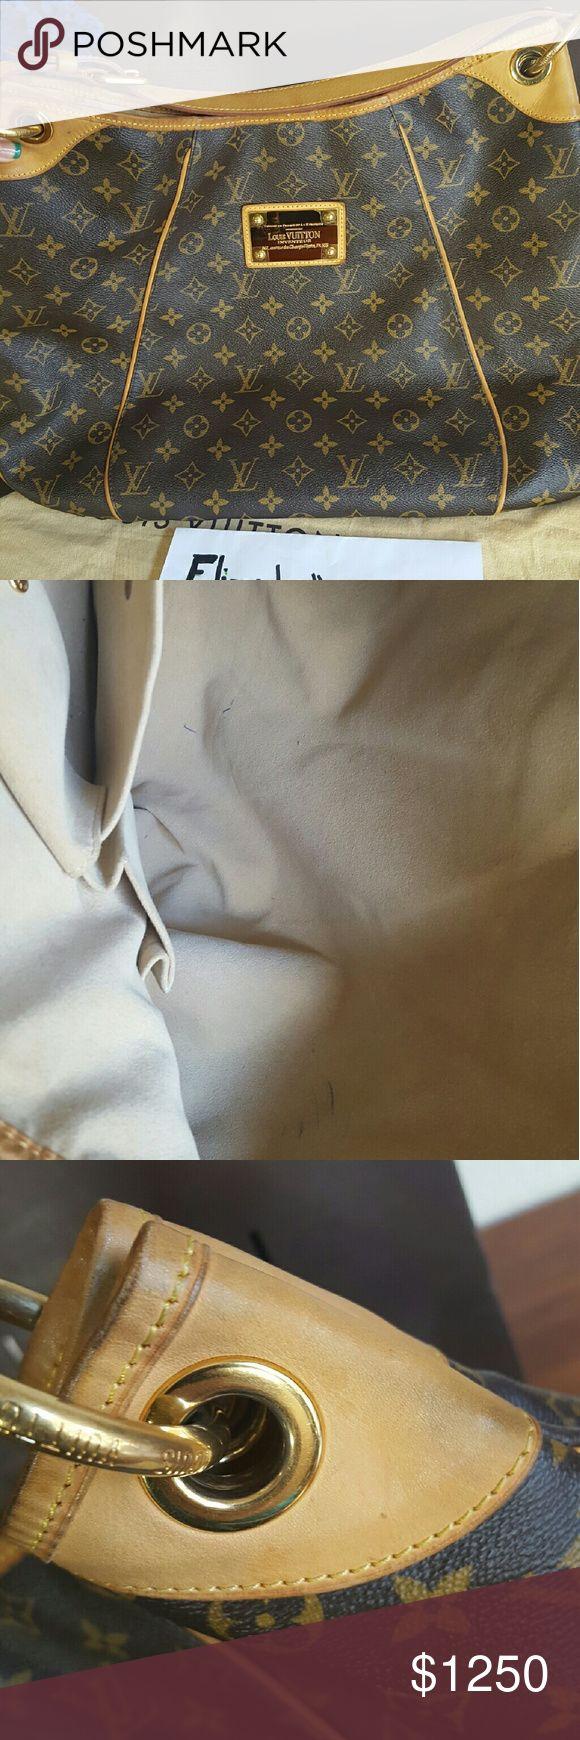 Auth Louis Vuitton Speedy 35 Boston Bag Vintage Preloved